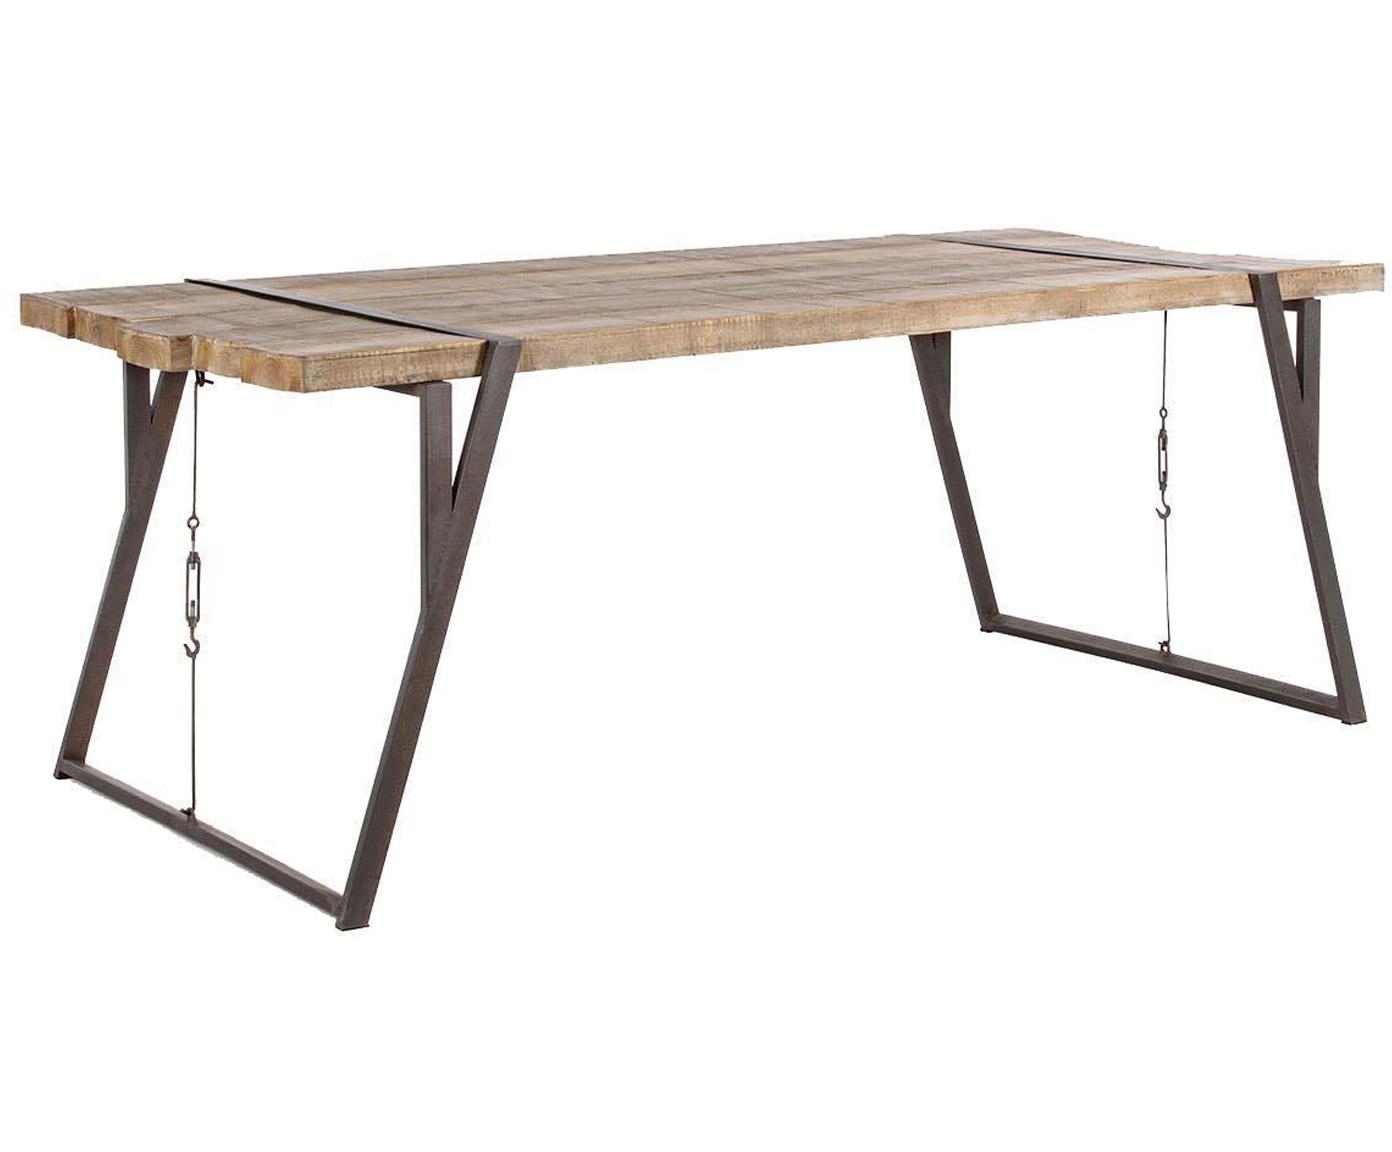 Mesa de comedor Blocks, Estructura: hierro, Tablero: madera de abeto, Negro, An 200 x F 54 cm